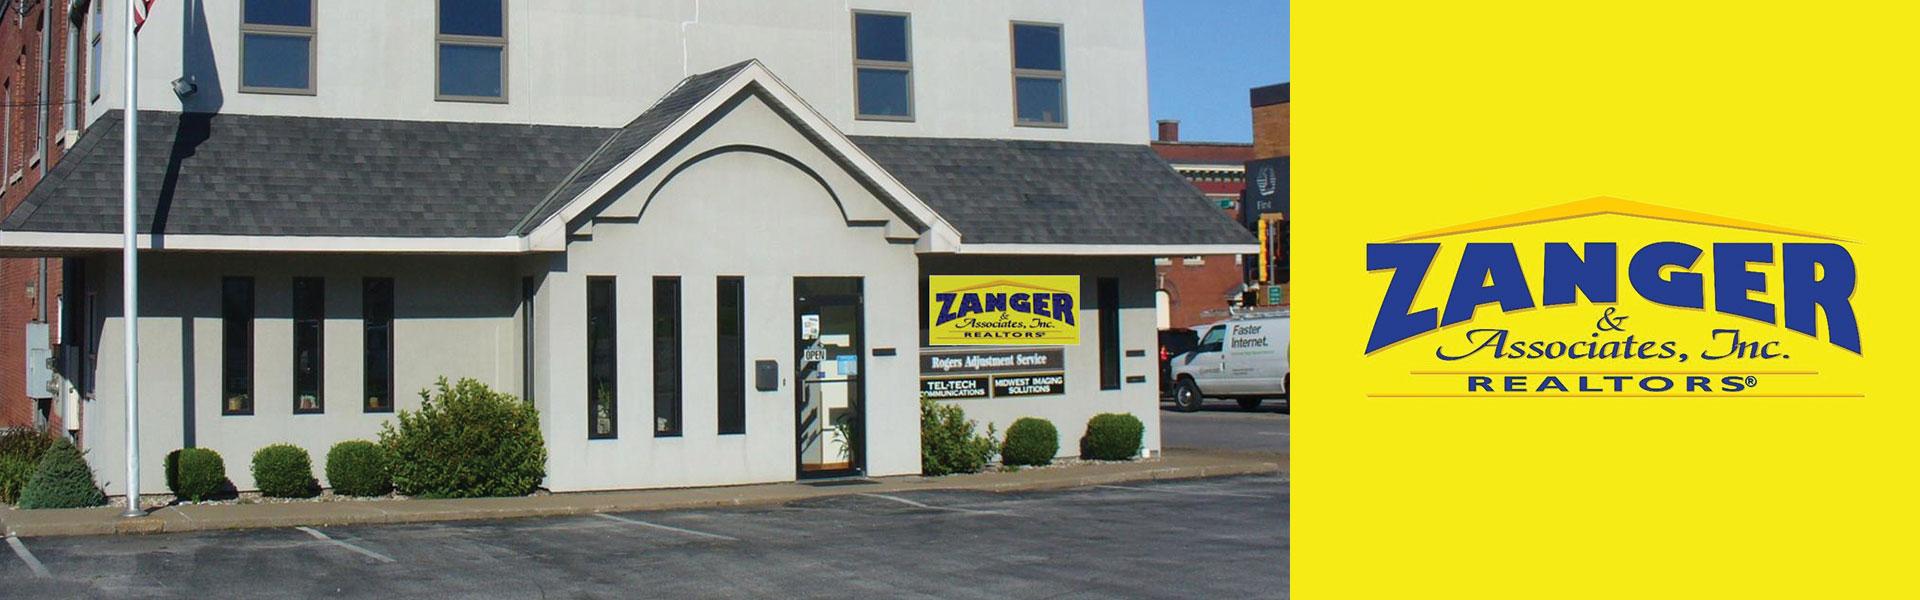 Zanger and Associates Office